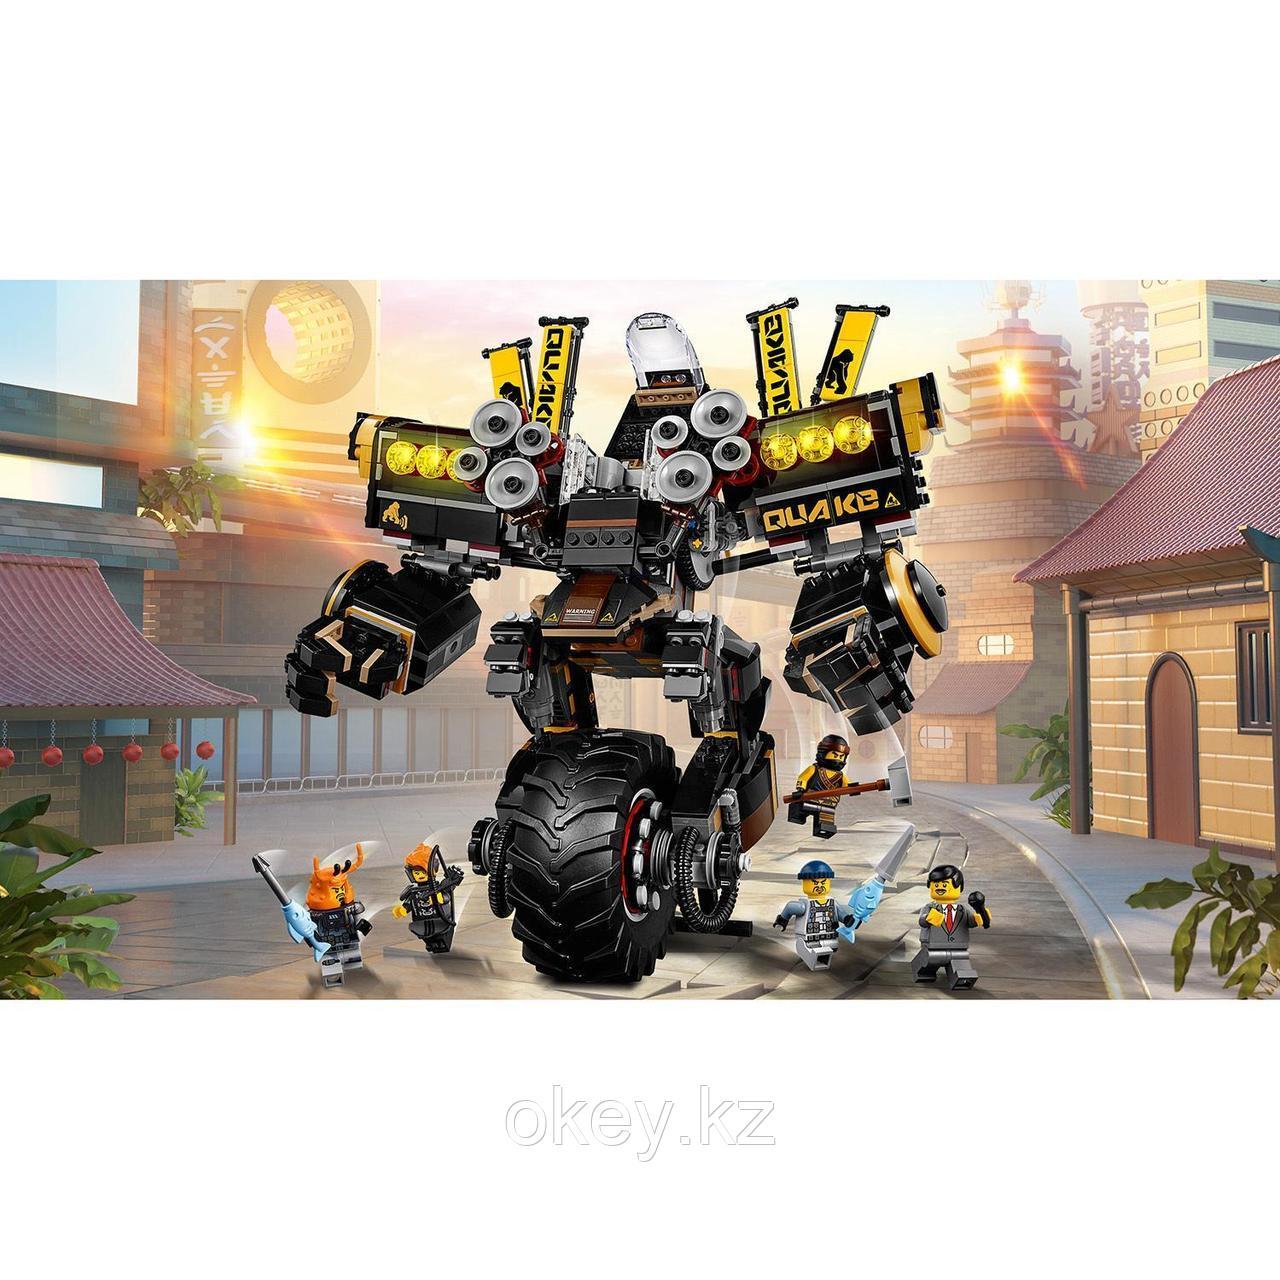 LEGO Ninjago Movie: Робот землетрясений 70632 - фото 5